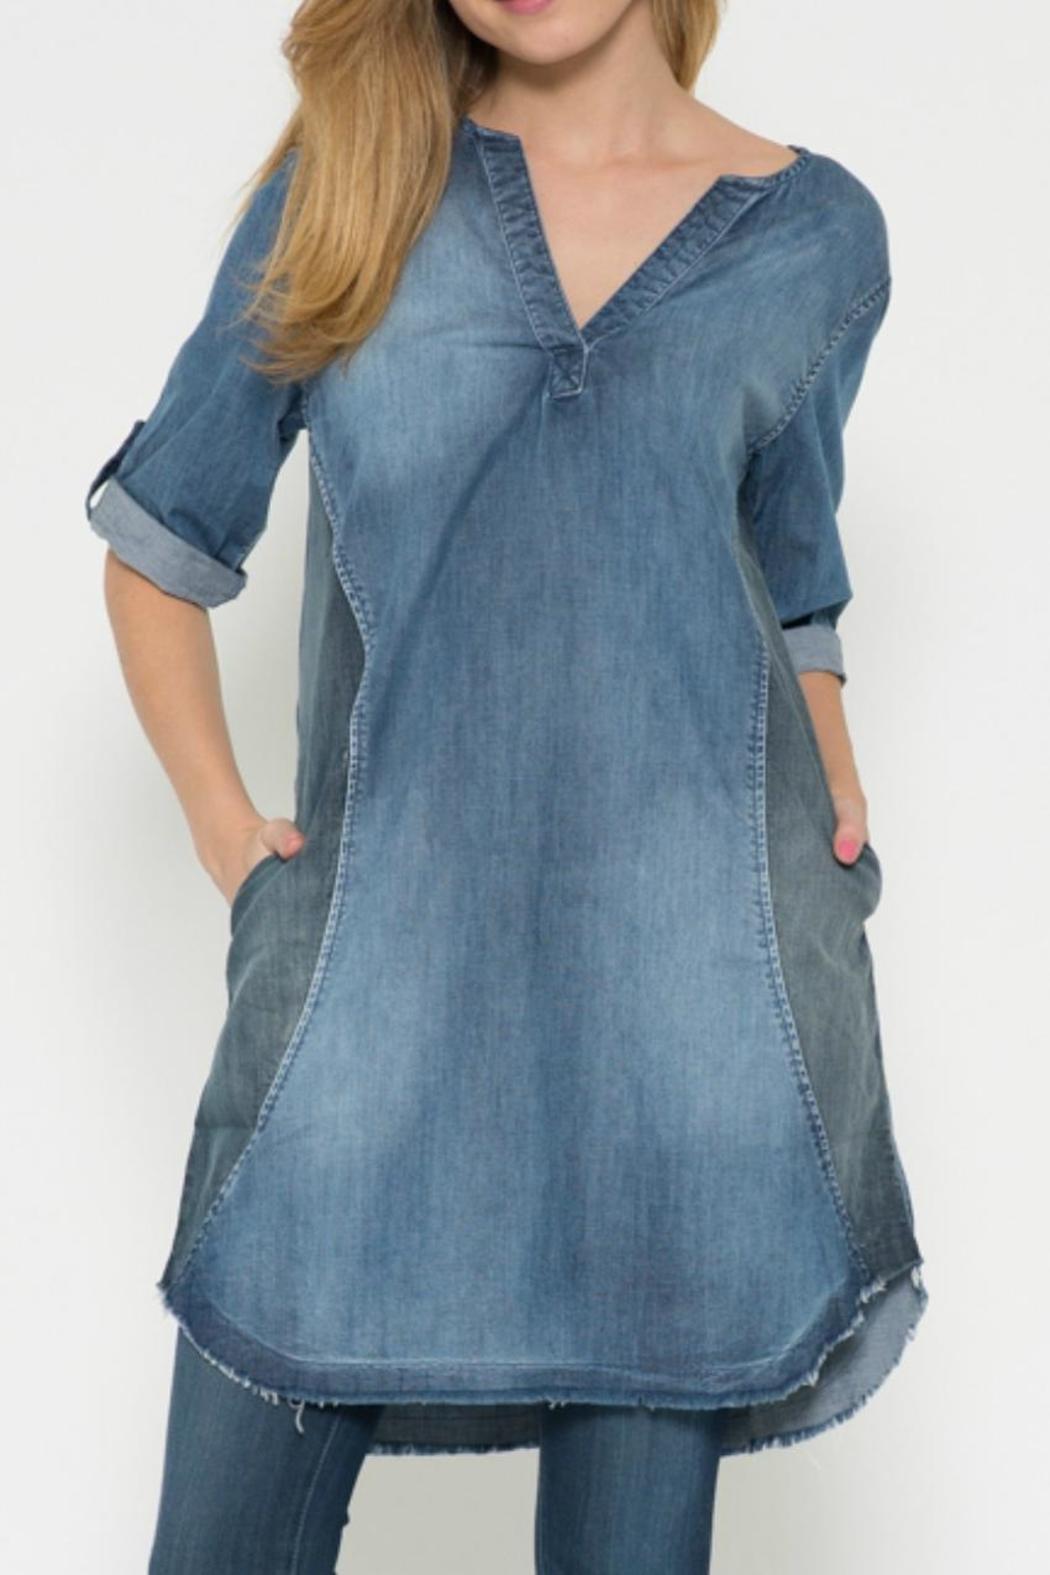 joh apparel denim tunic dress - main image hbadujz